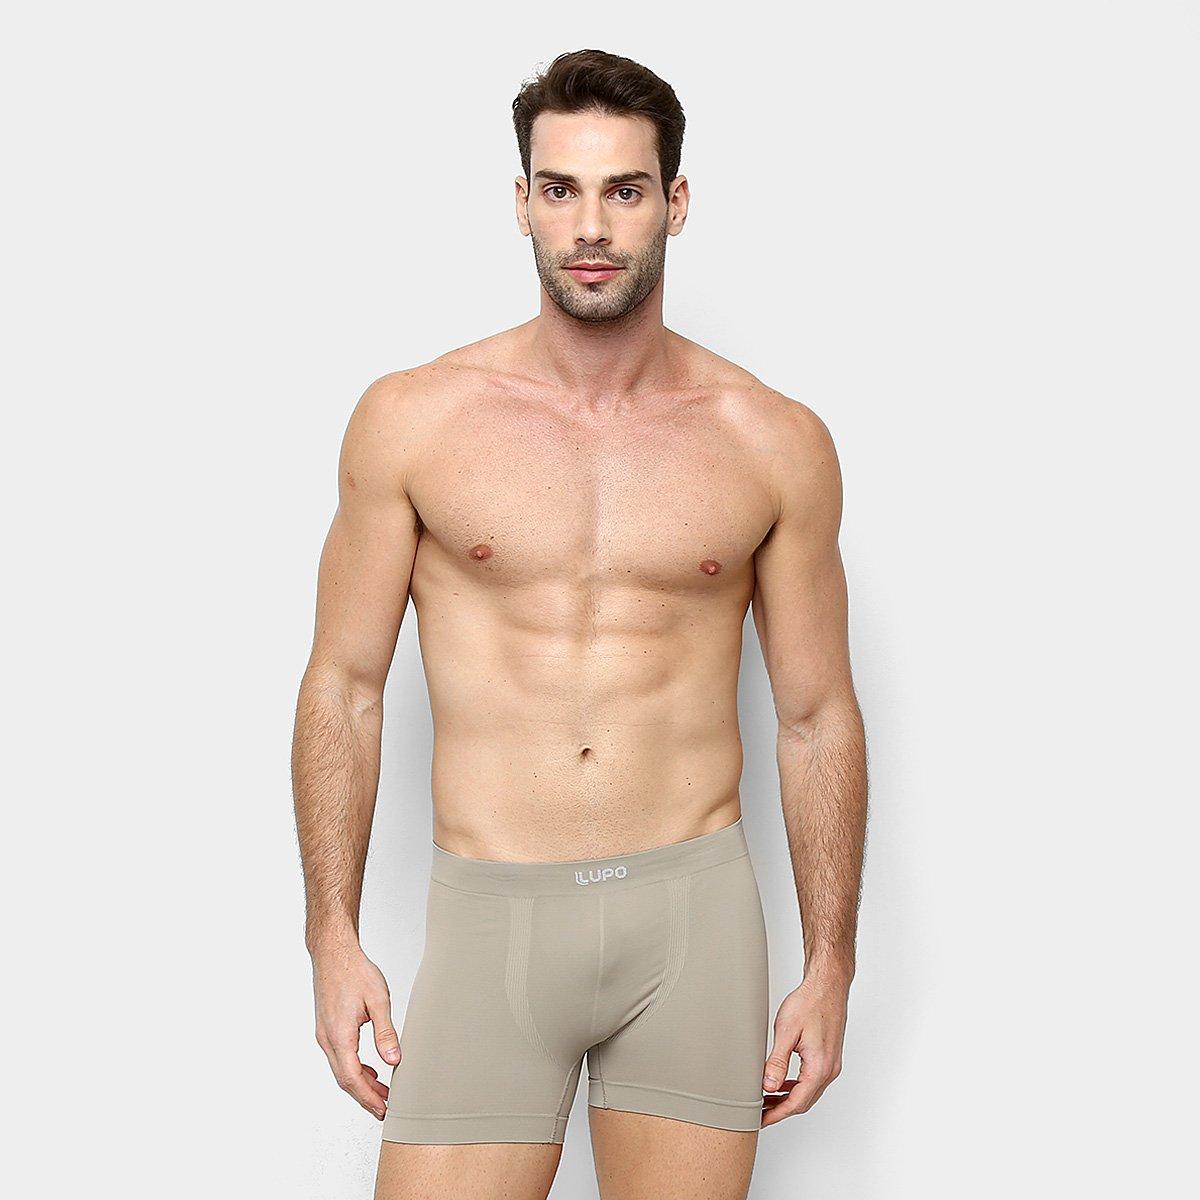 Cueca Boxer Sem Costura Lupo Masculina - Tam: P - 1